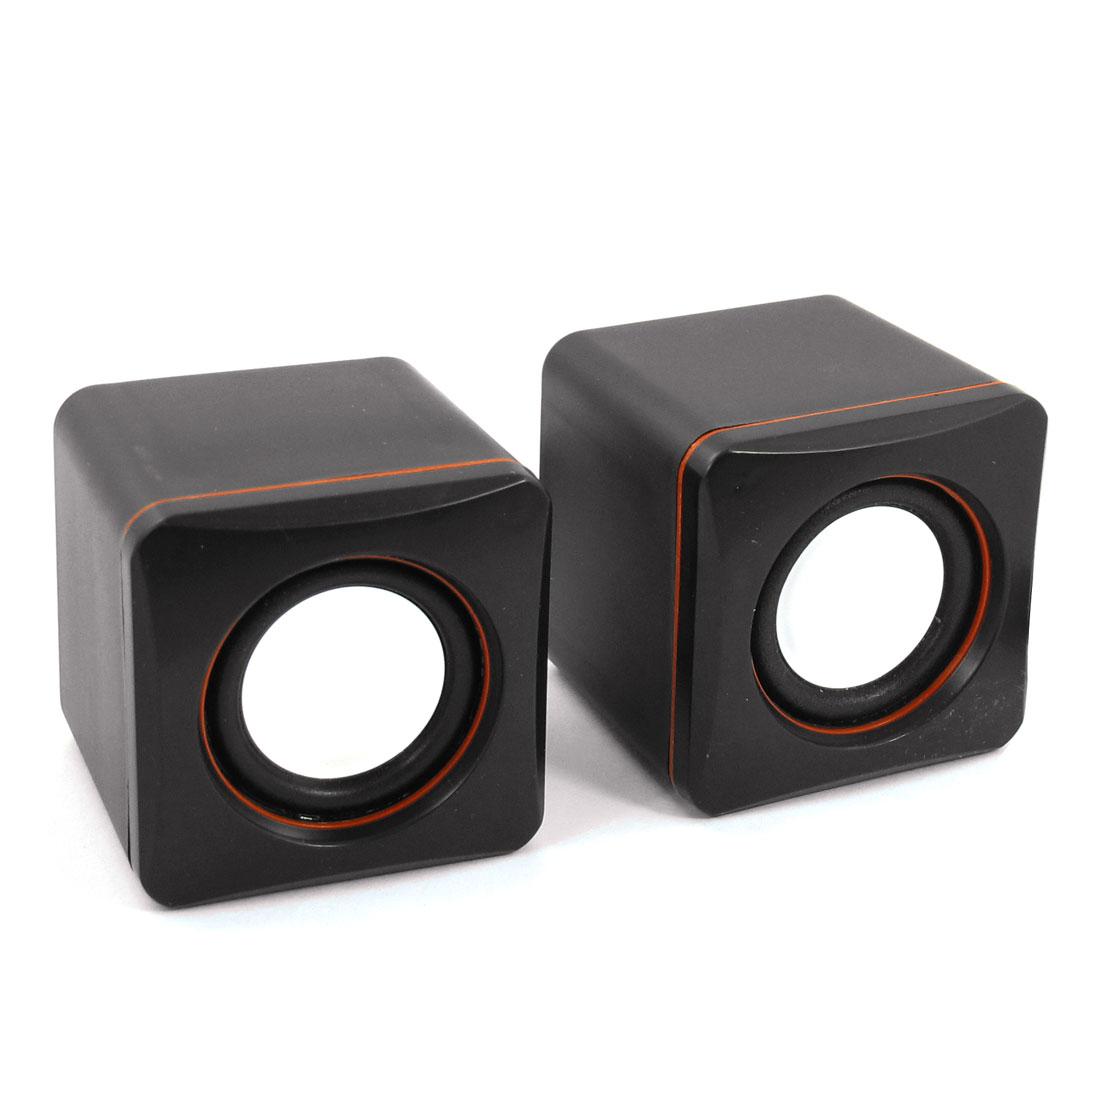 Pair Black Cube USB 2.0 3.5mm Stereo Mini Multimedia Speaker Sound Box